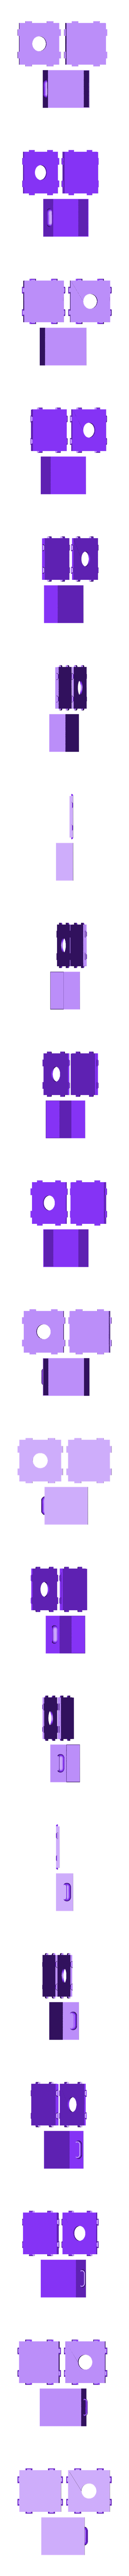 box_top_bottom_n_drawer.stl Download free STL file Coffee Grinder • 3D printer template, Wachet